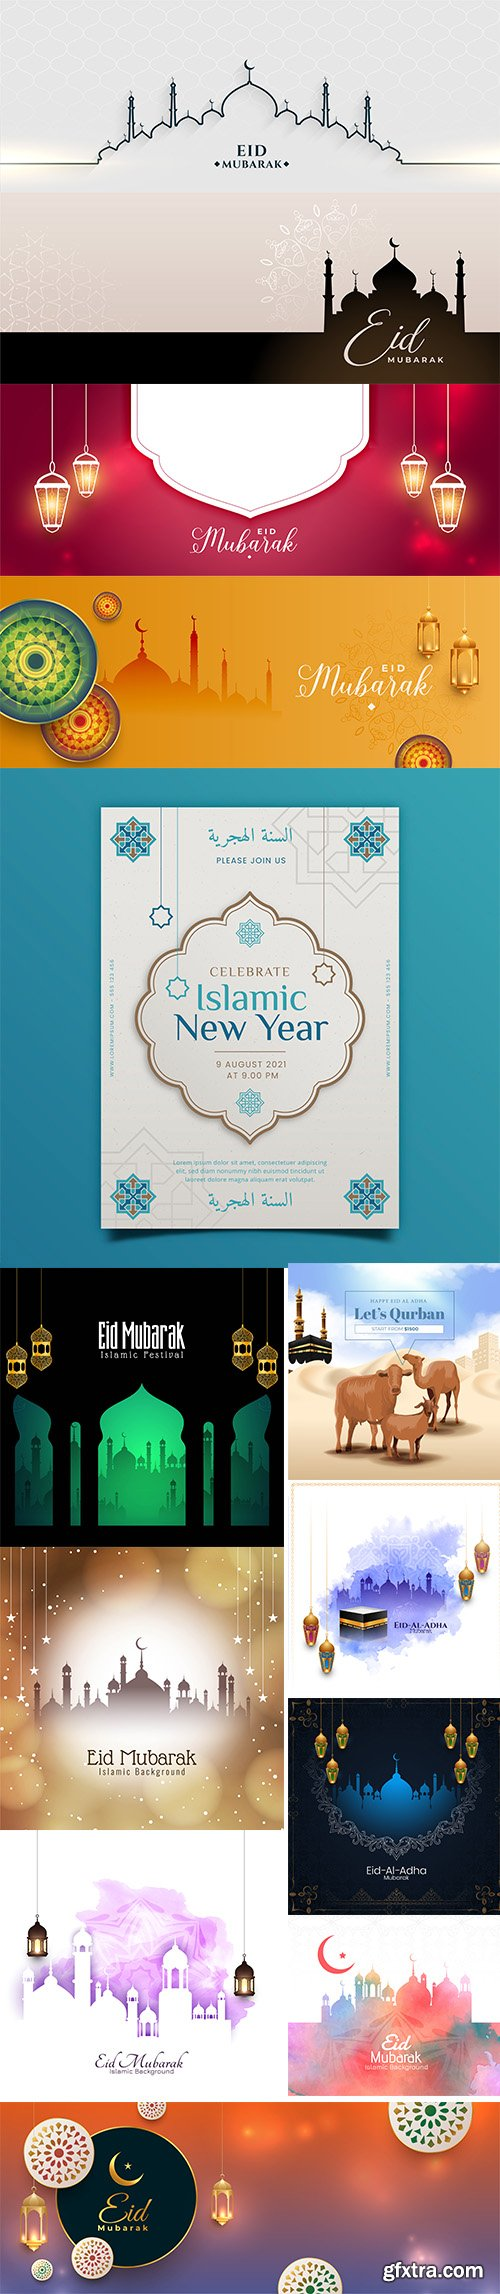 Eid mubarak banner with beautiful colors